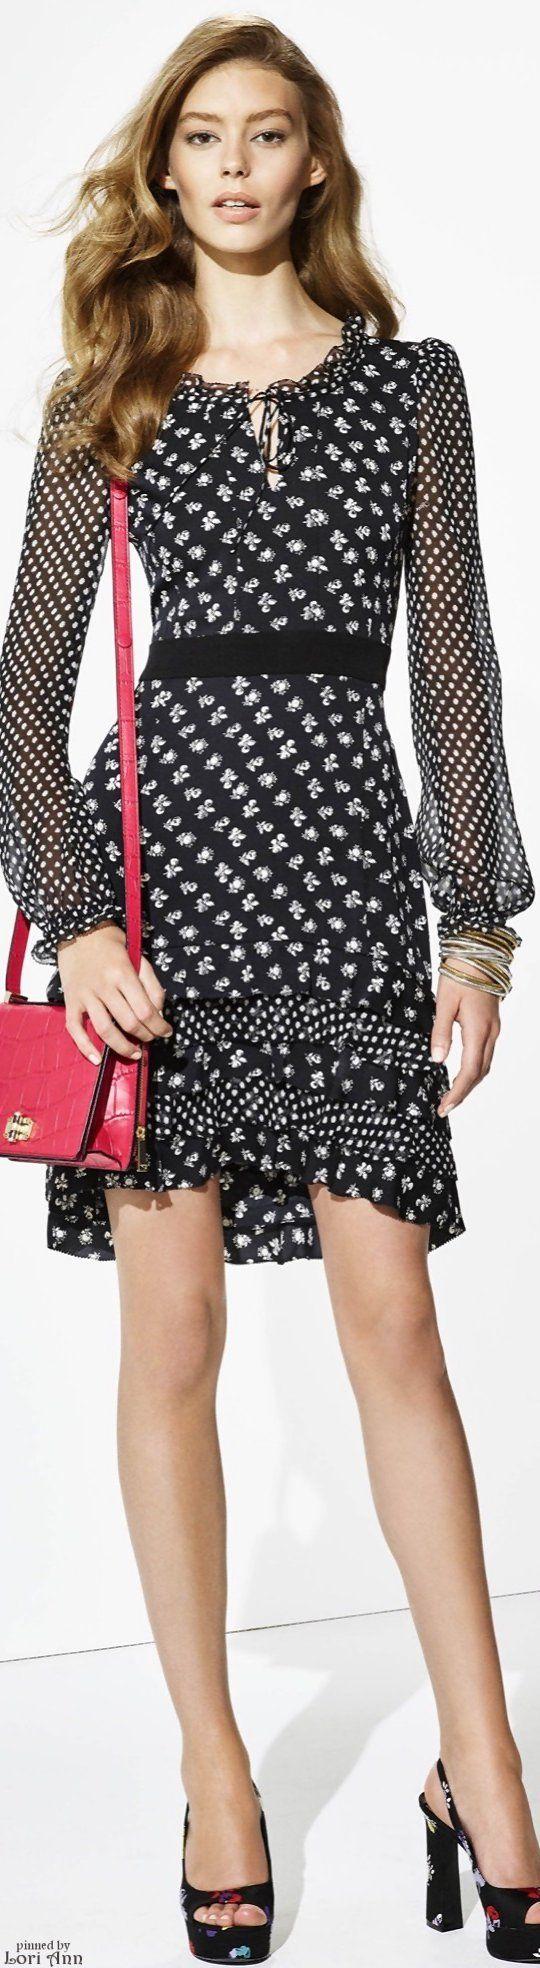 best western gown images on pinterest cute dresses feminine